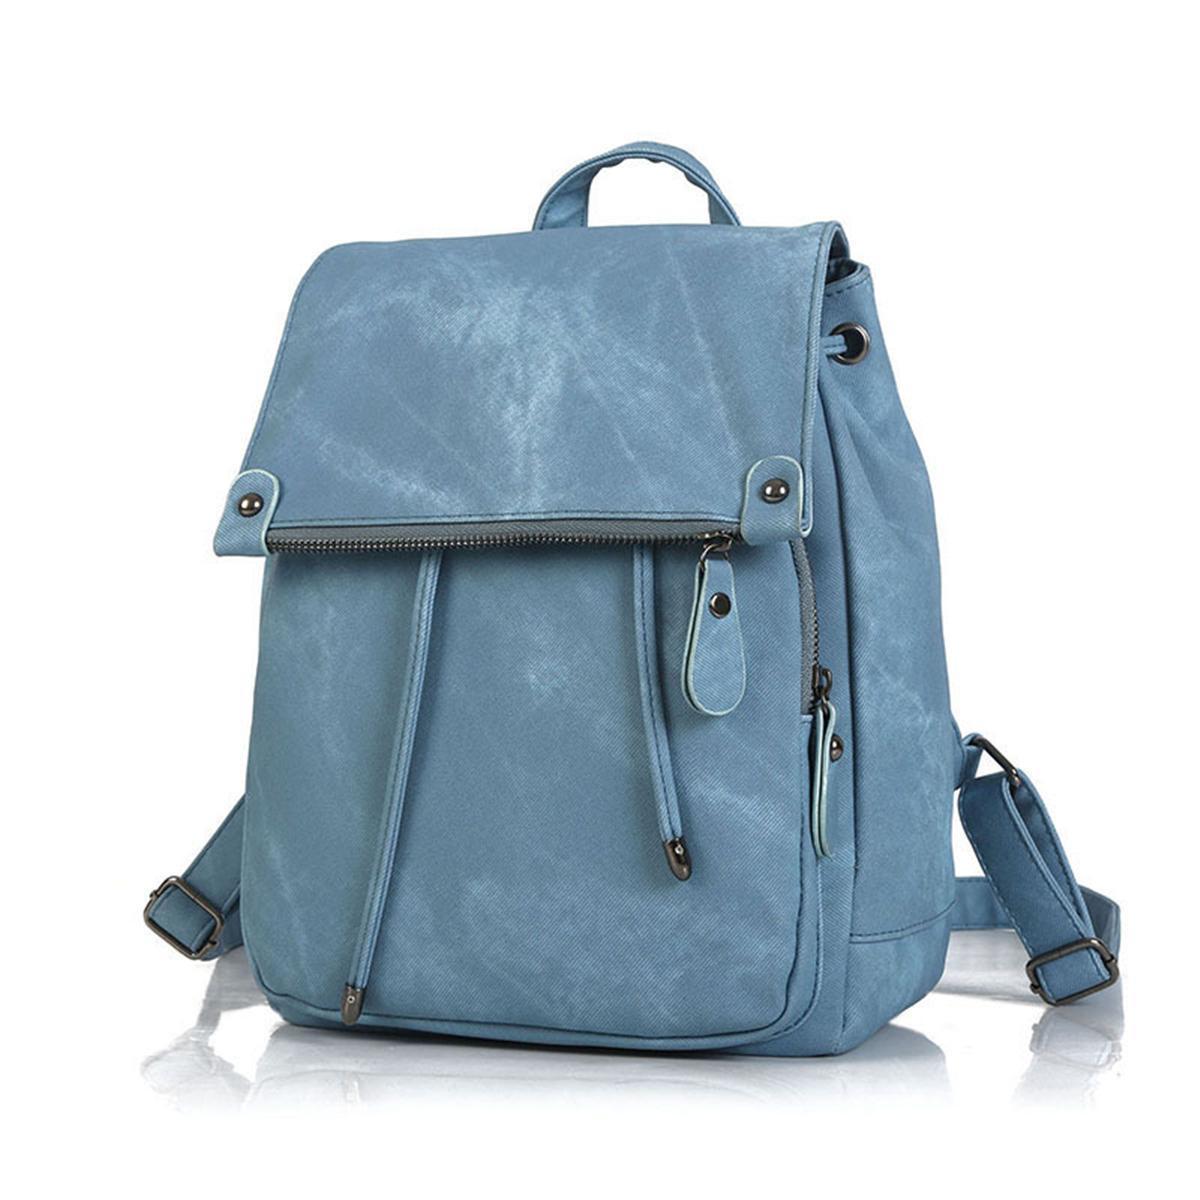 e0665776dab Fashion Women PU Leather Backpack Travel Bag Shoulder Messenger School  Rucksack